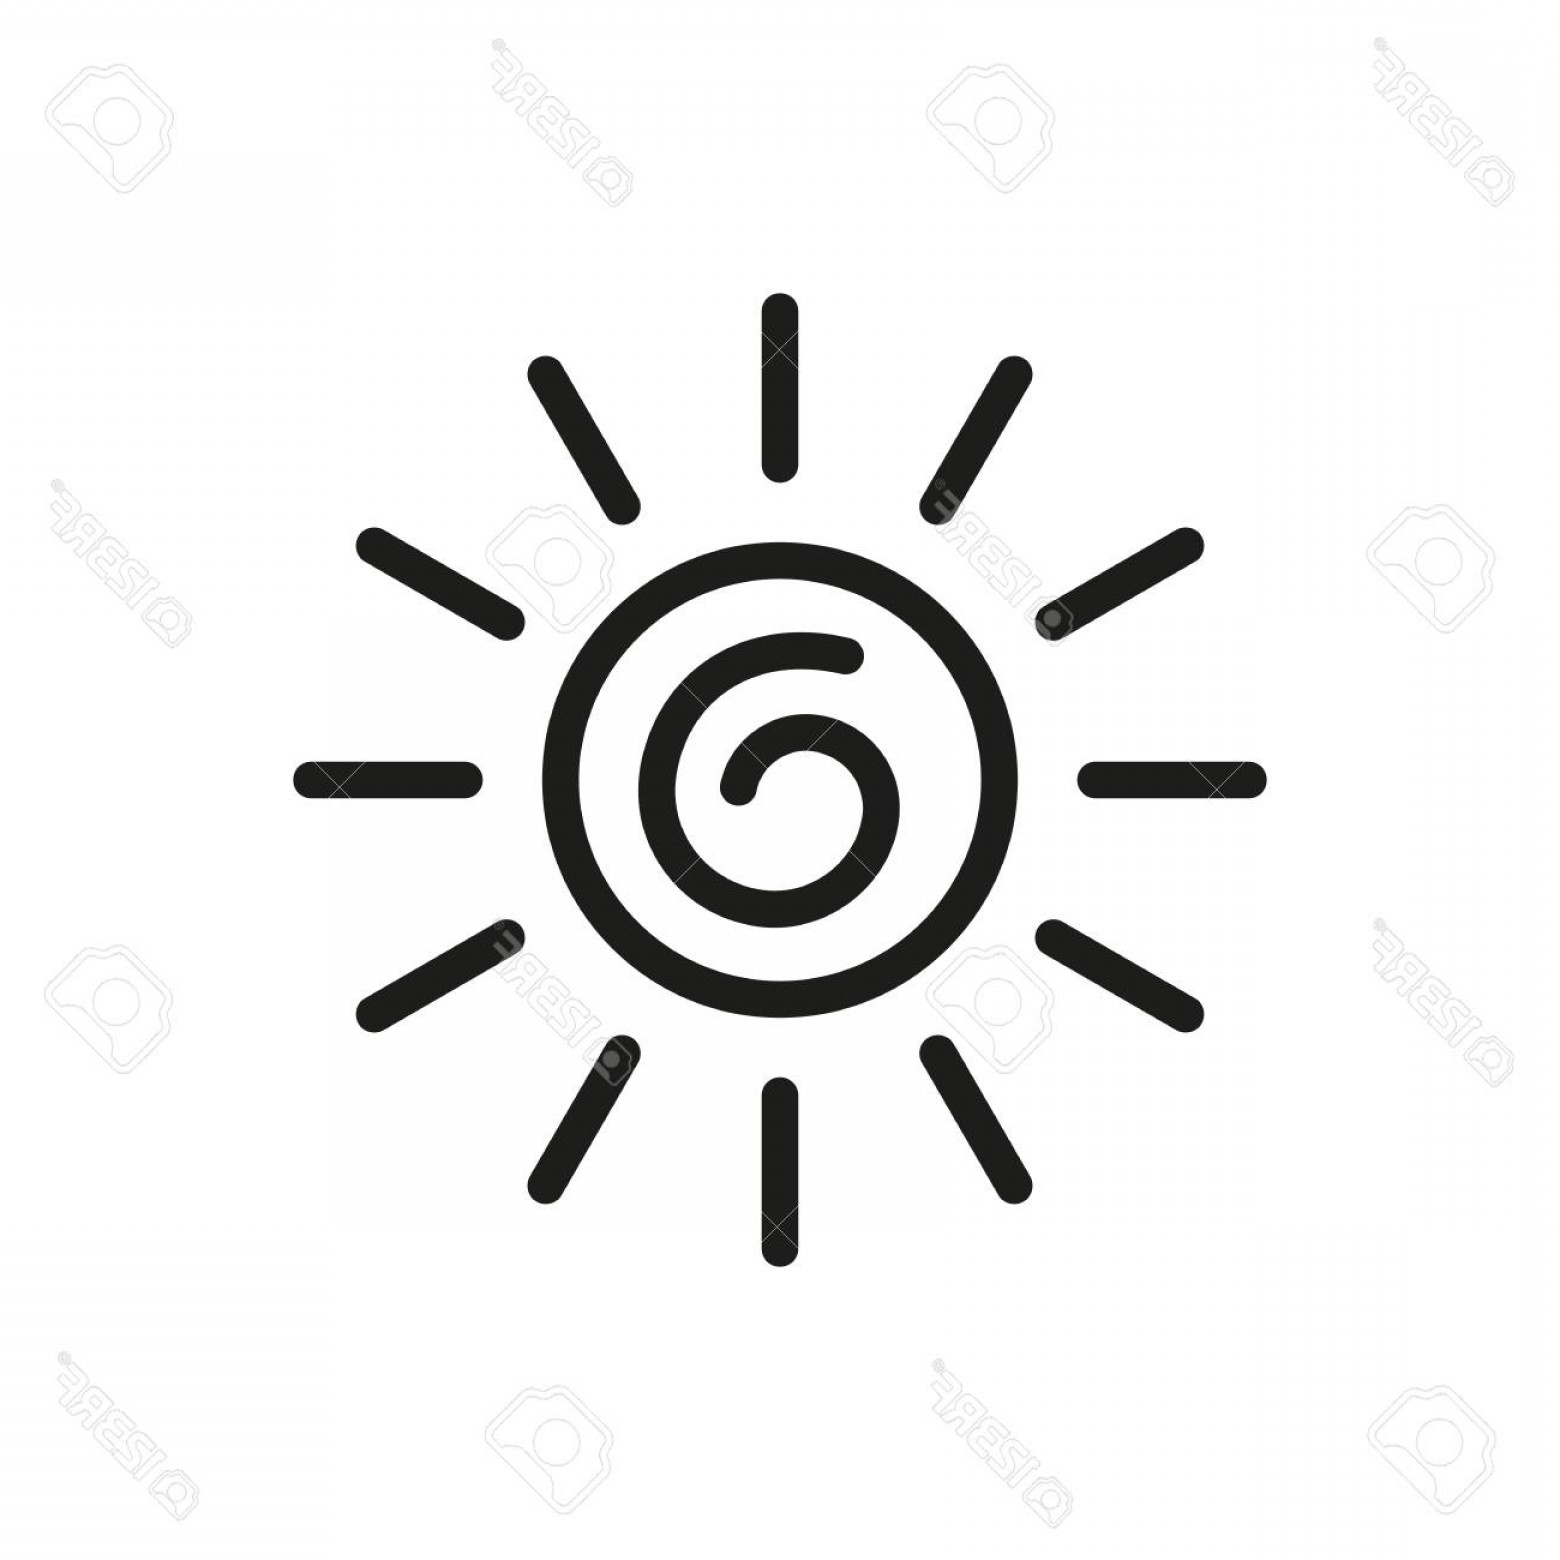 1560x1560 Photostock Vector Simple Sun Icon Vector Illustration Isolated On